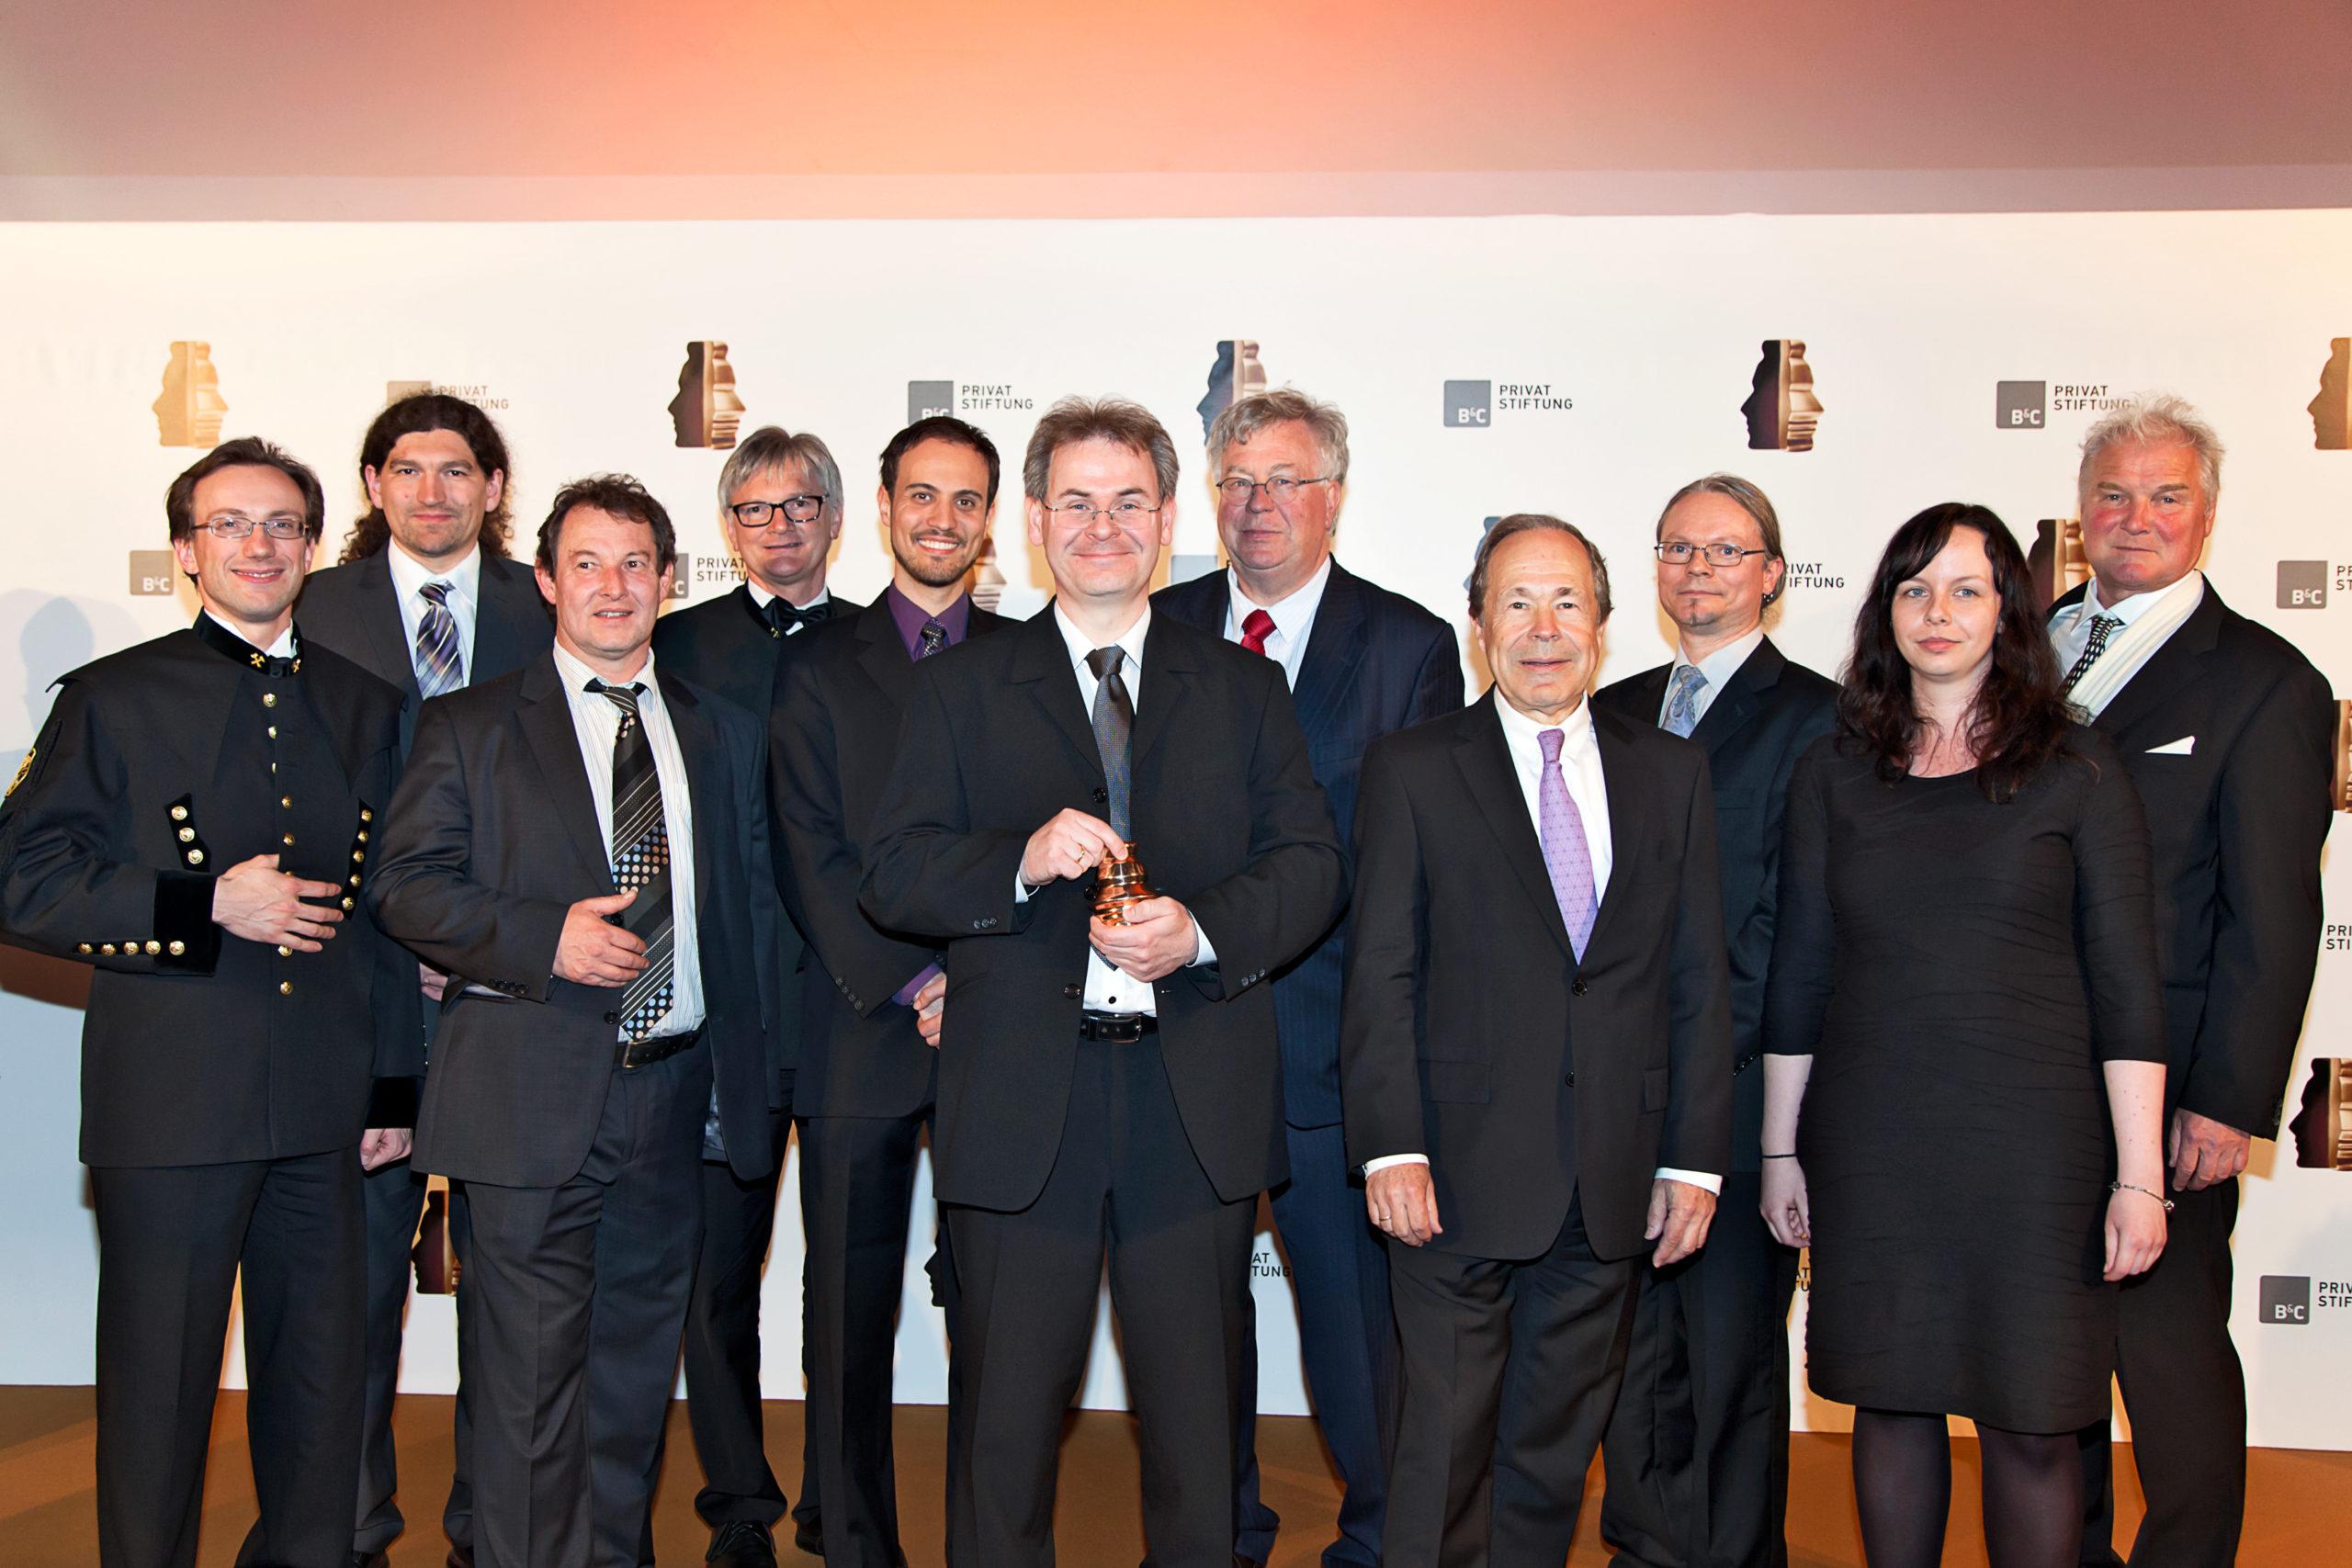 3. Platz Houskapreis 2014